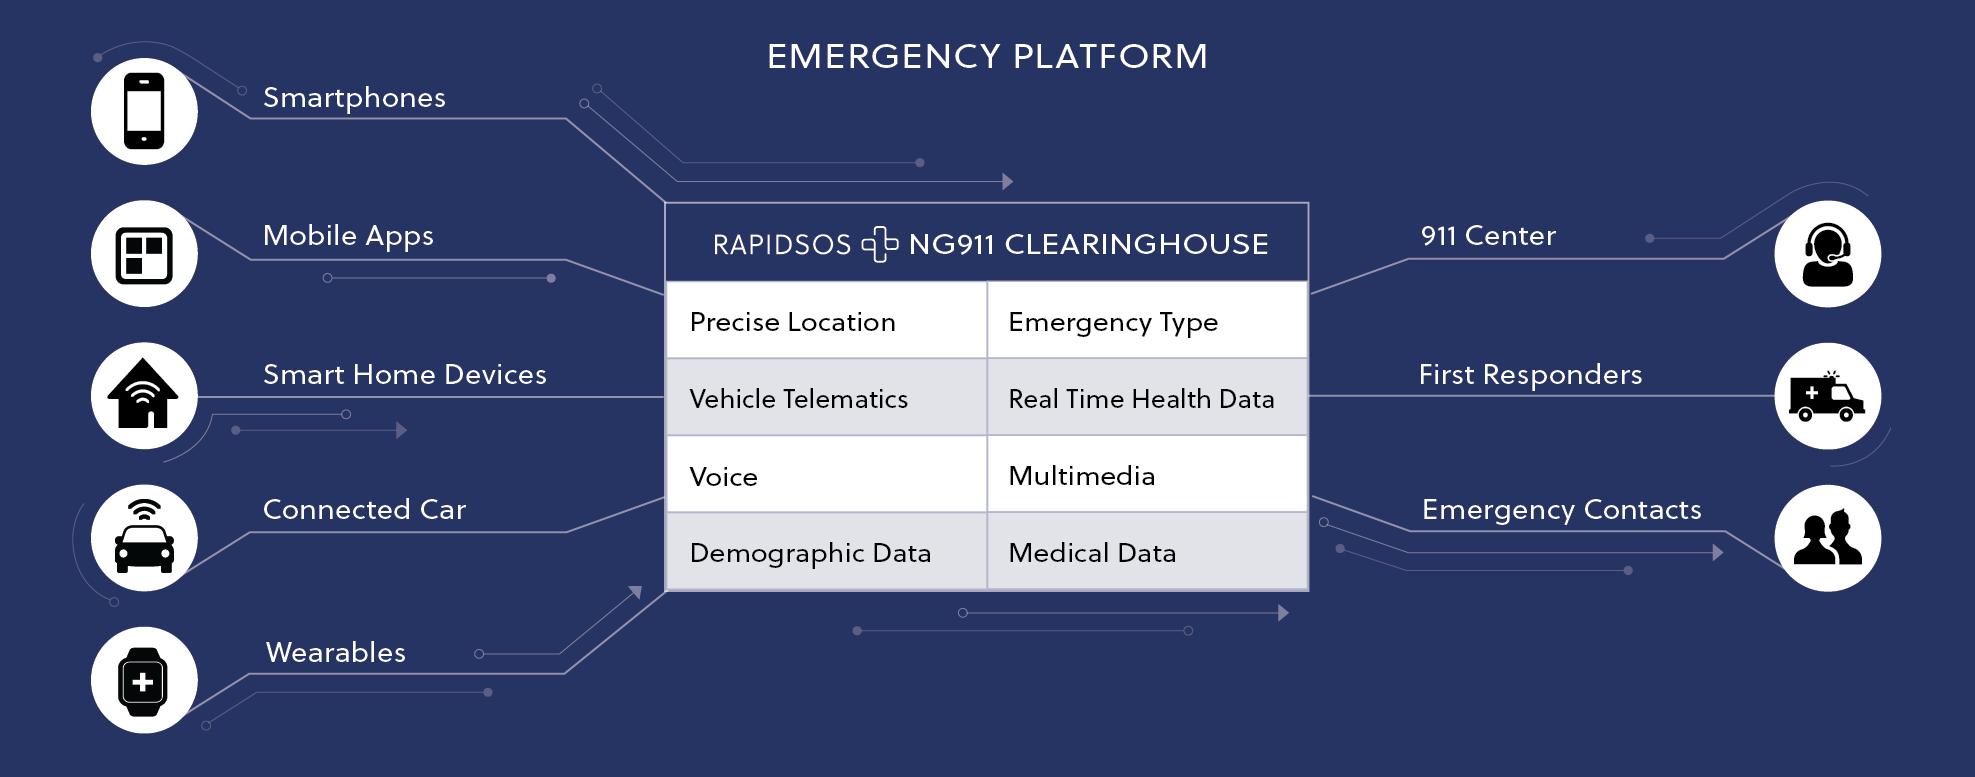 RapidSOS Emergency Platform